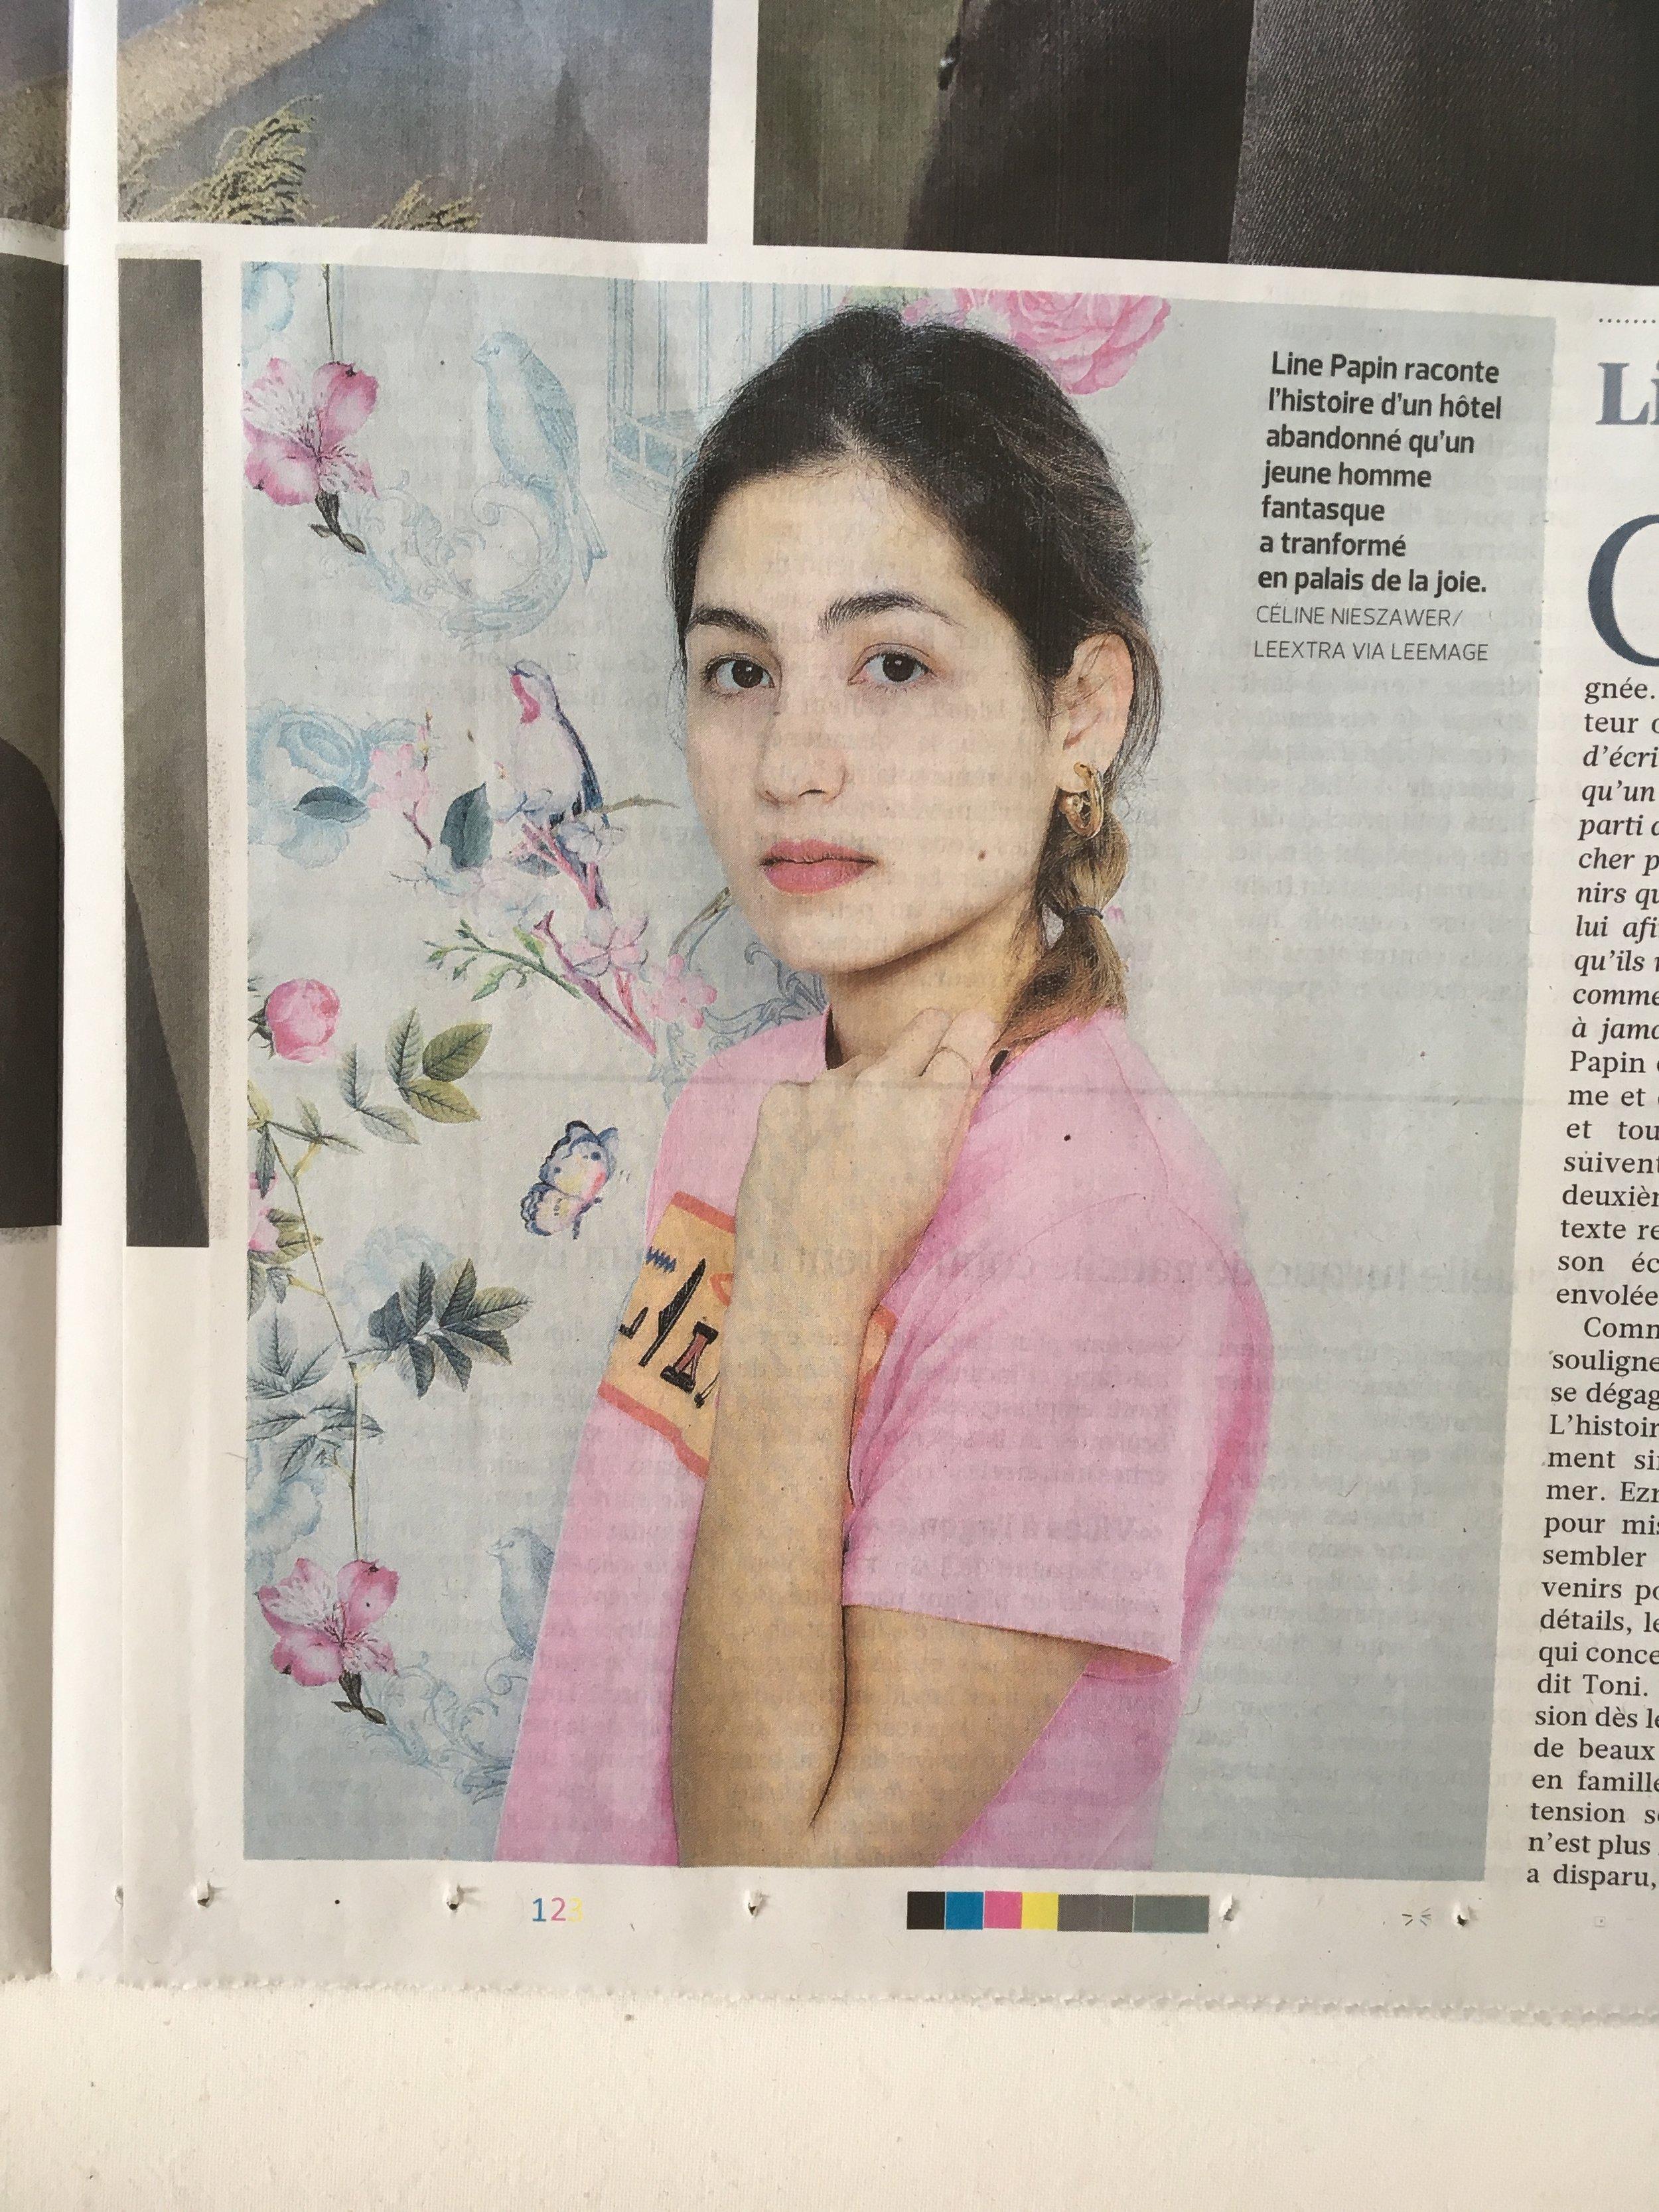 Line Papin dans le Figaro - Mars 2018